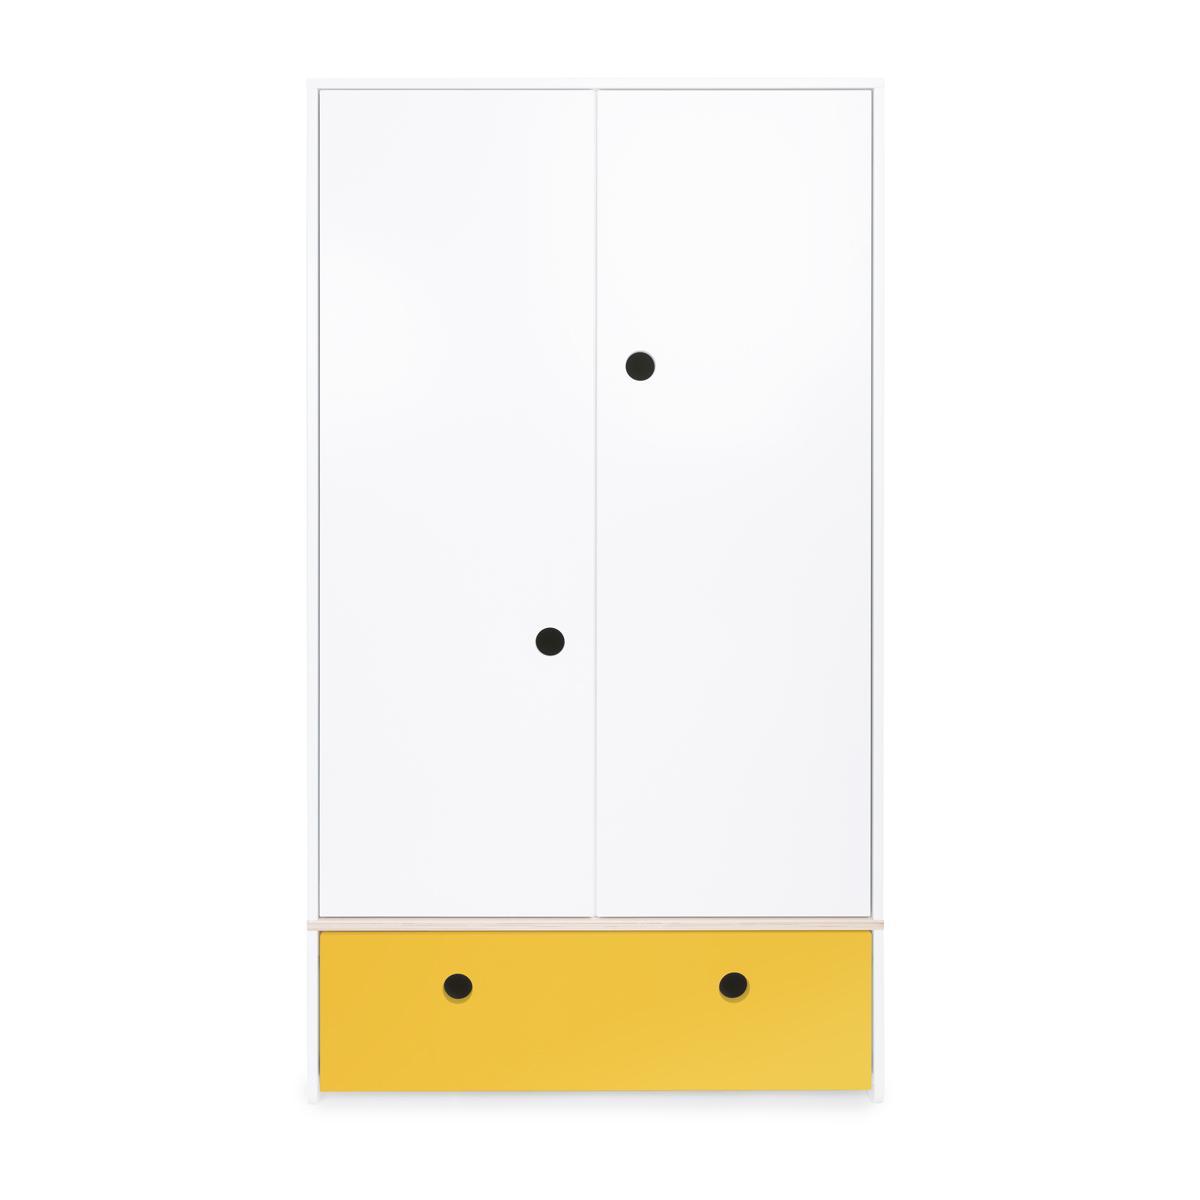 Armario 2 puertas COLORFLEX Abitare Kids cajón frontal nectar yellow